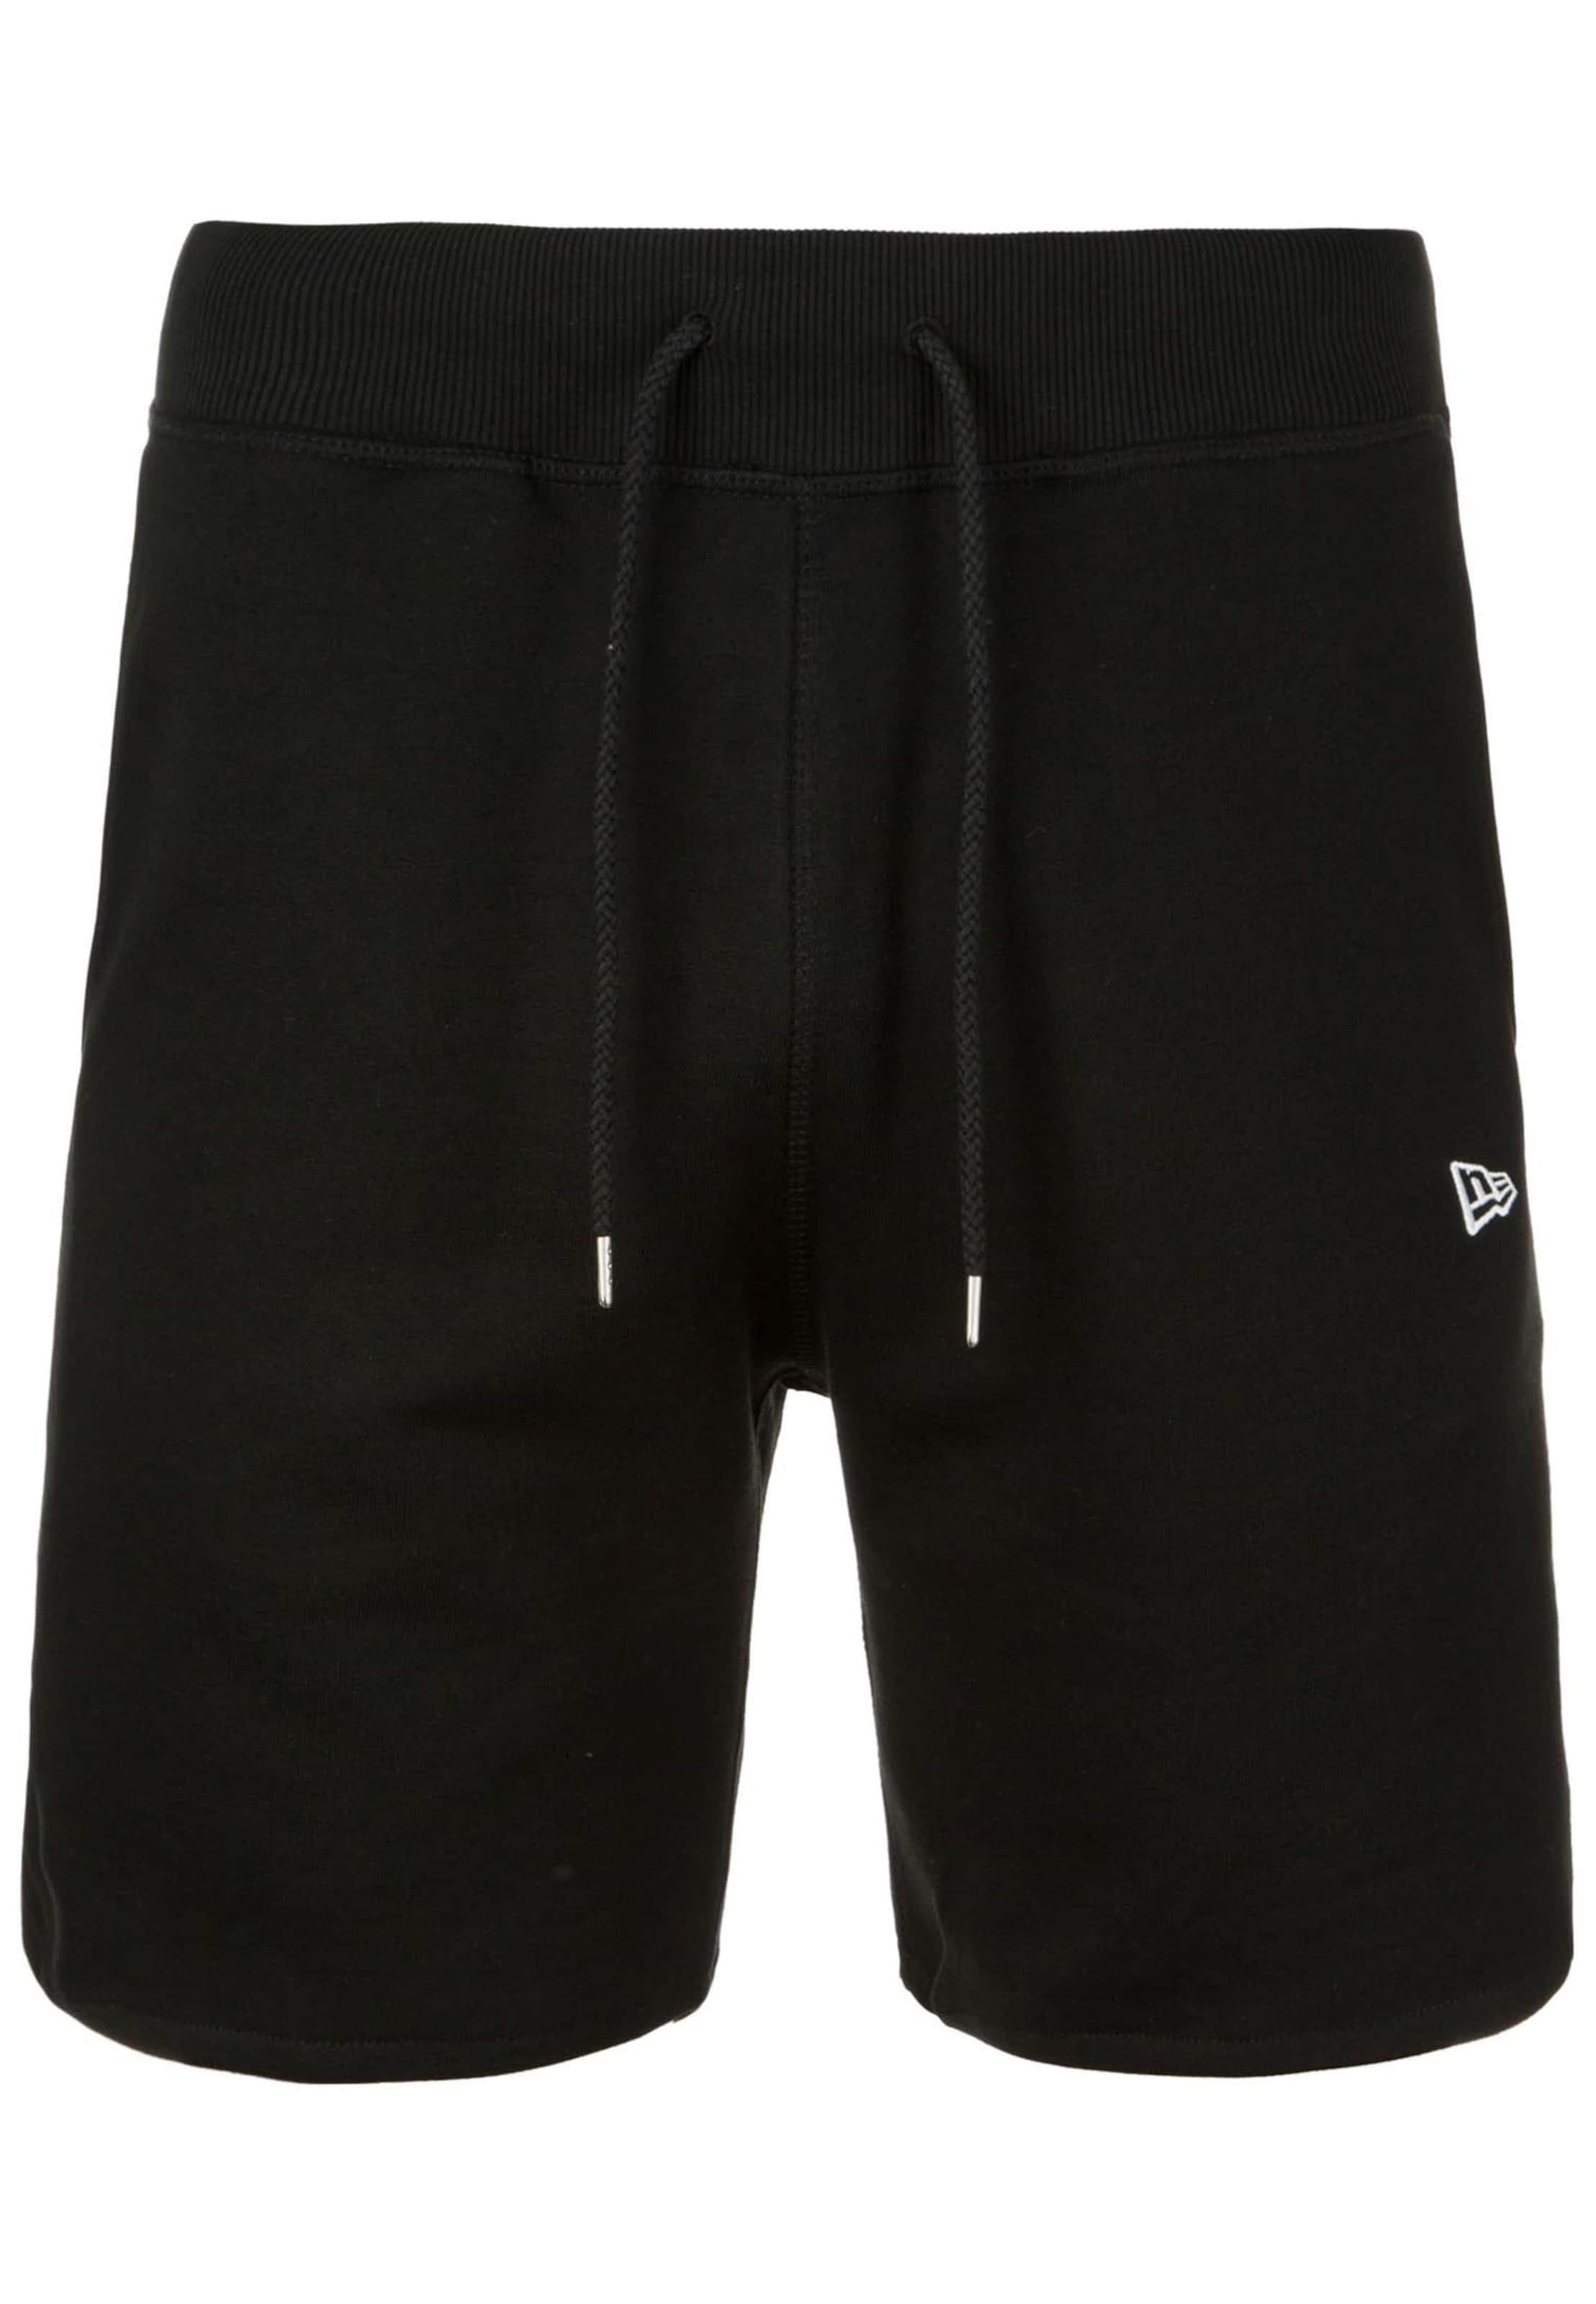 New Era Pack' En Pantalon 'college Noir XOkPZiu